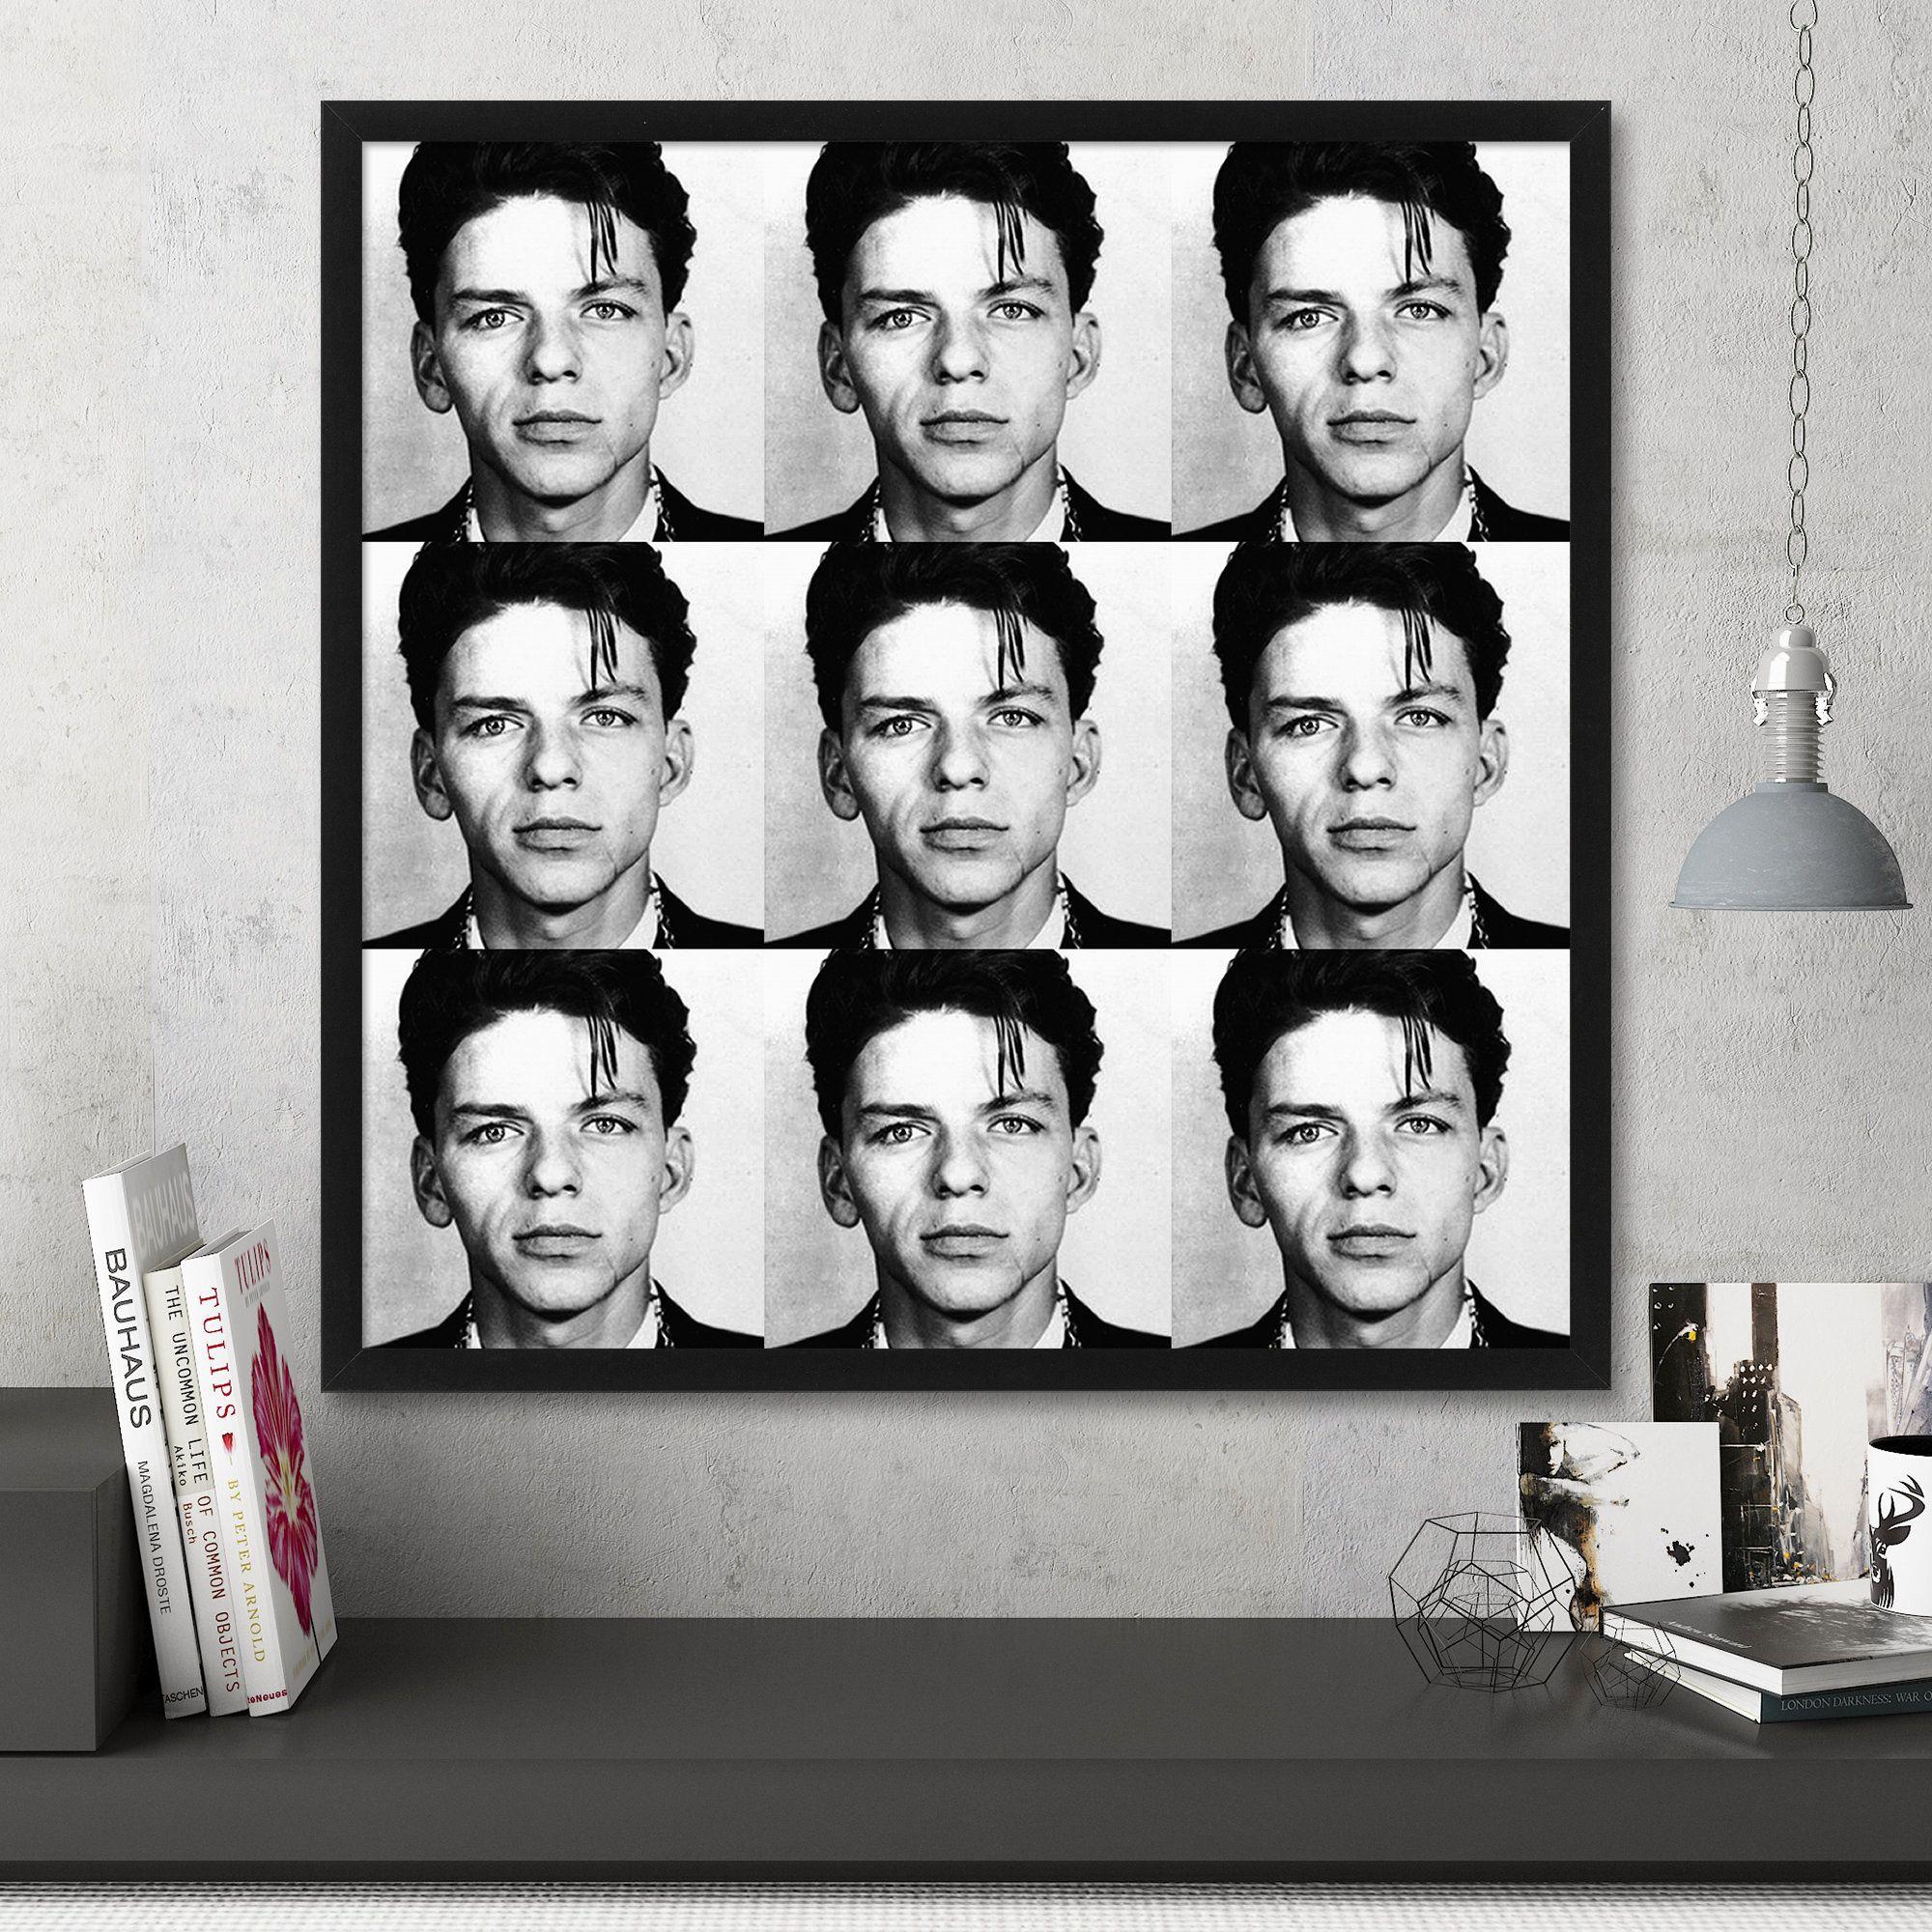 Frank Sinatra Mugshot Print, Large Wall Art, Pop Art